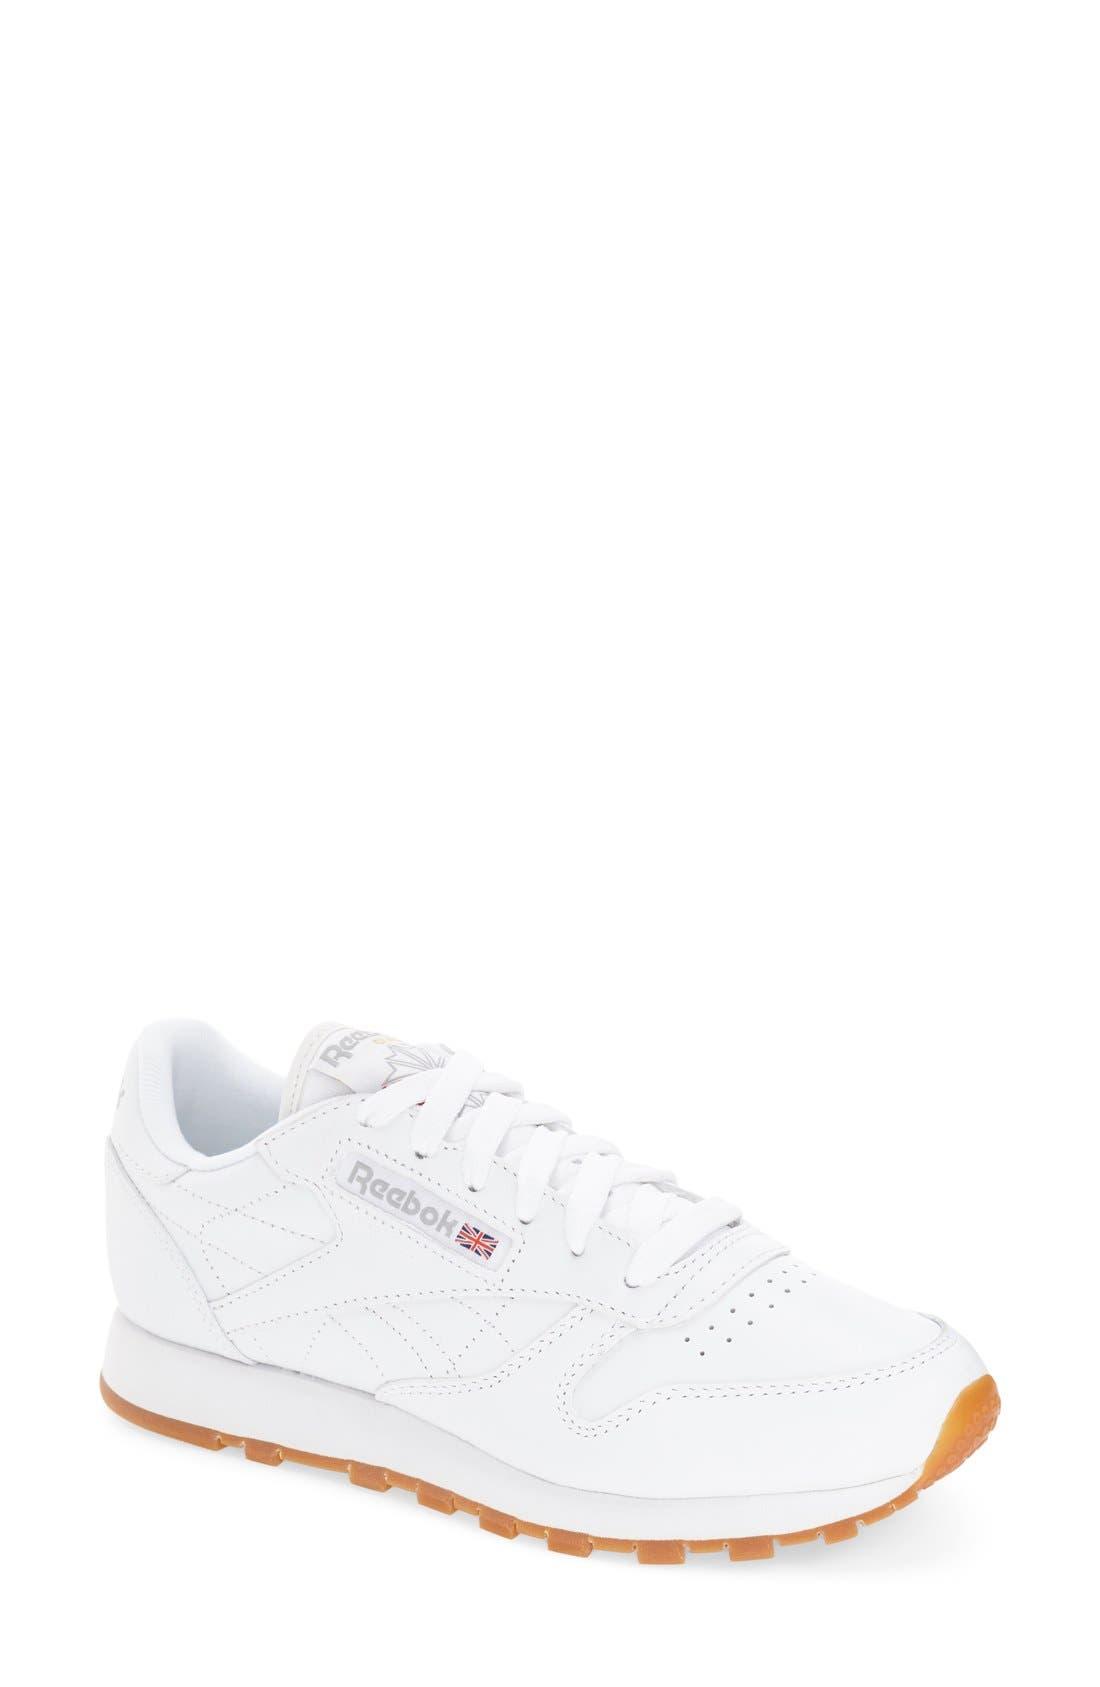 Main Image - Reebok 'Classic' Sneaker (Women)